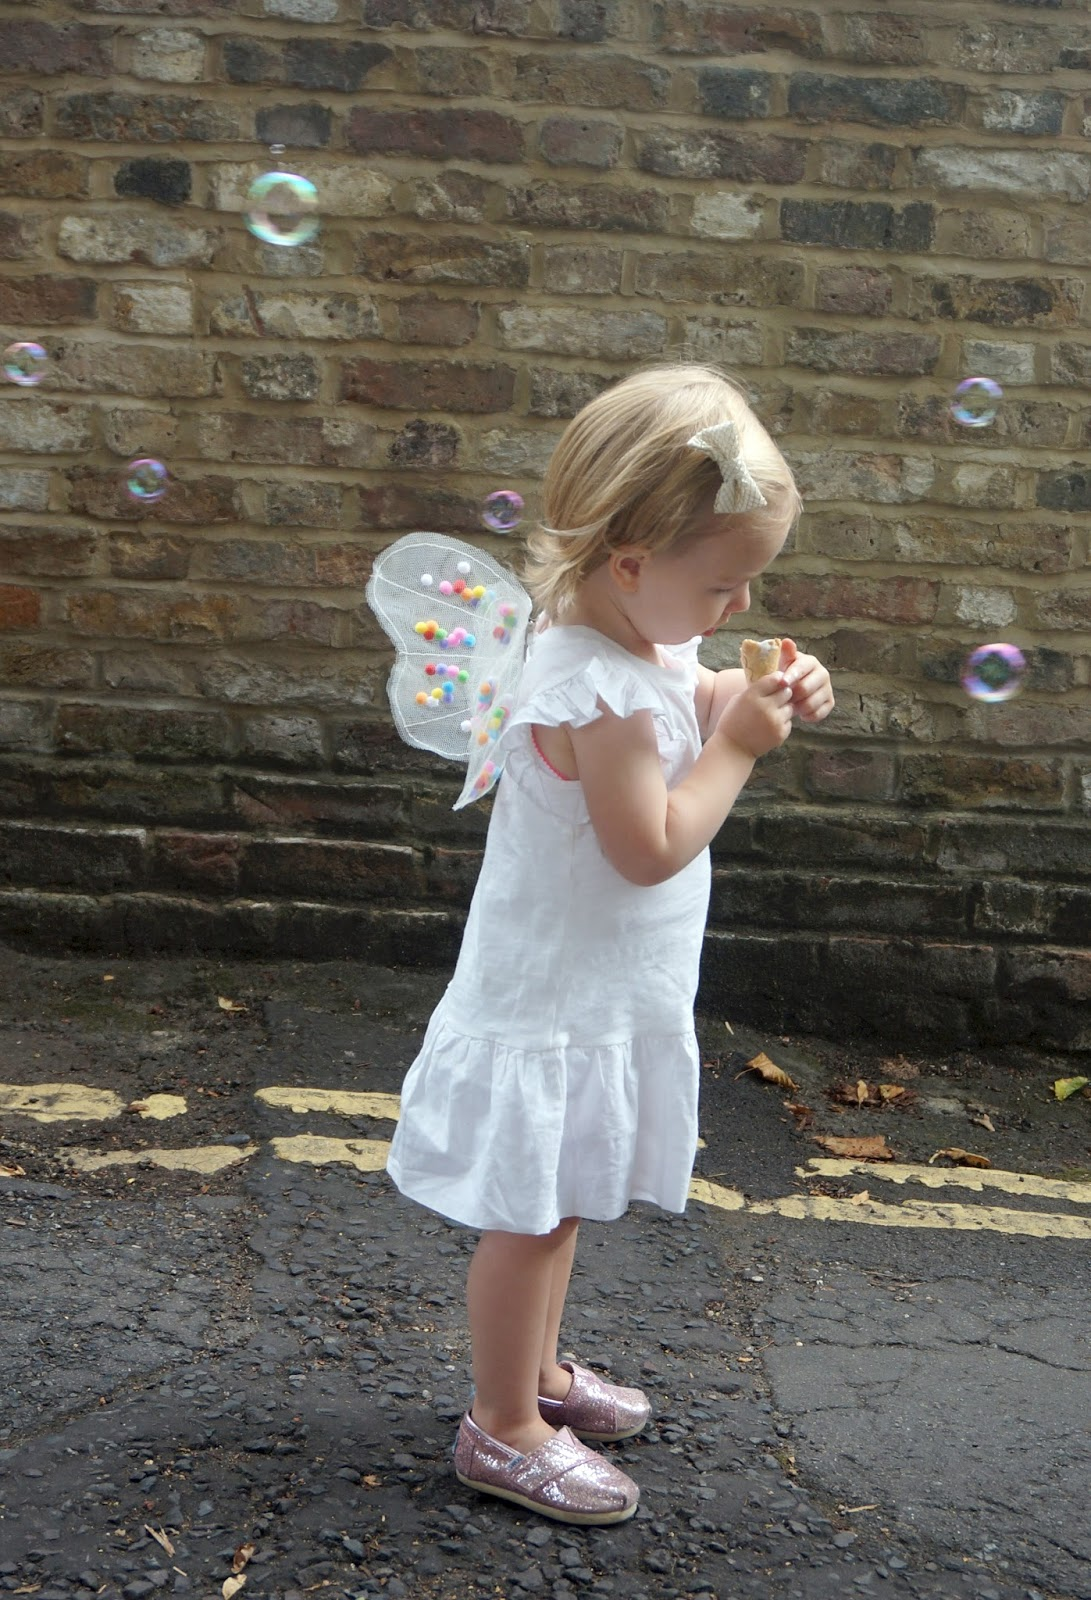 meg-made confetti mariposa butterfly wings girls